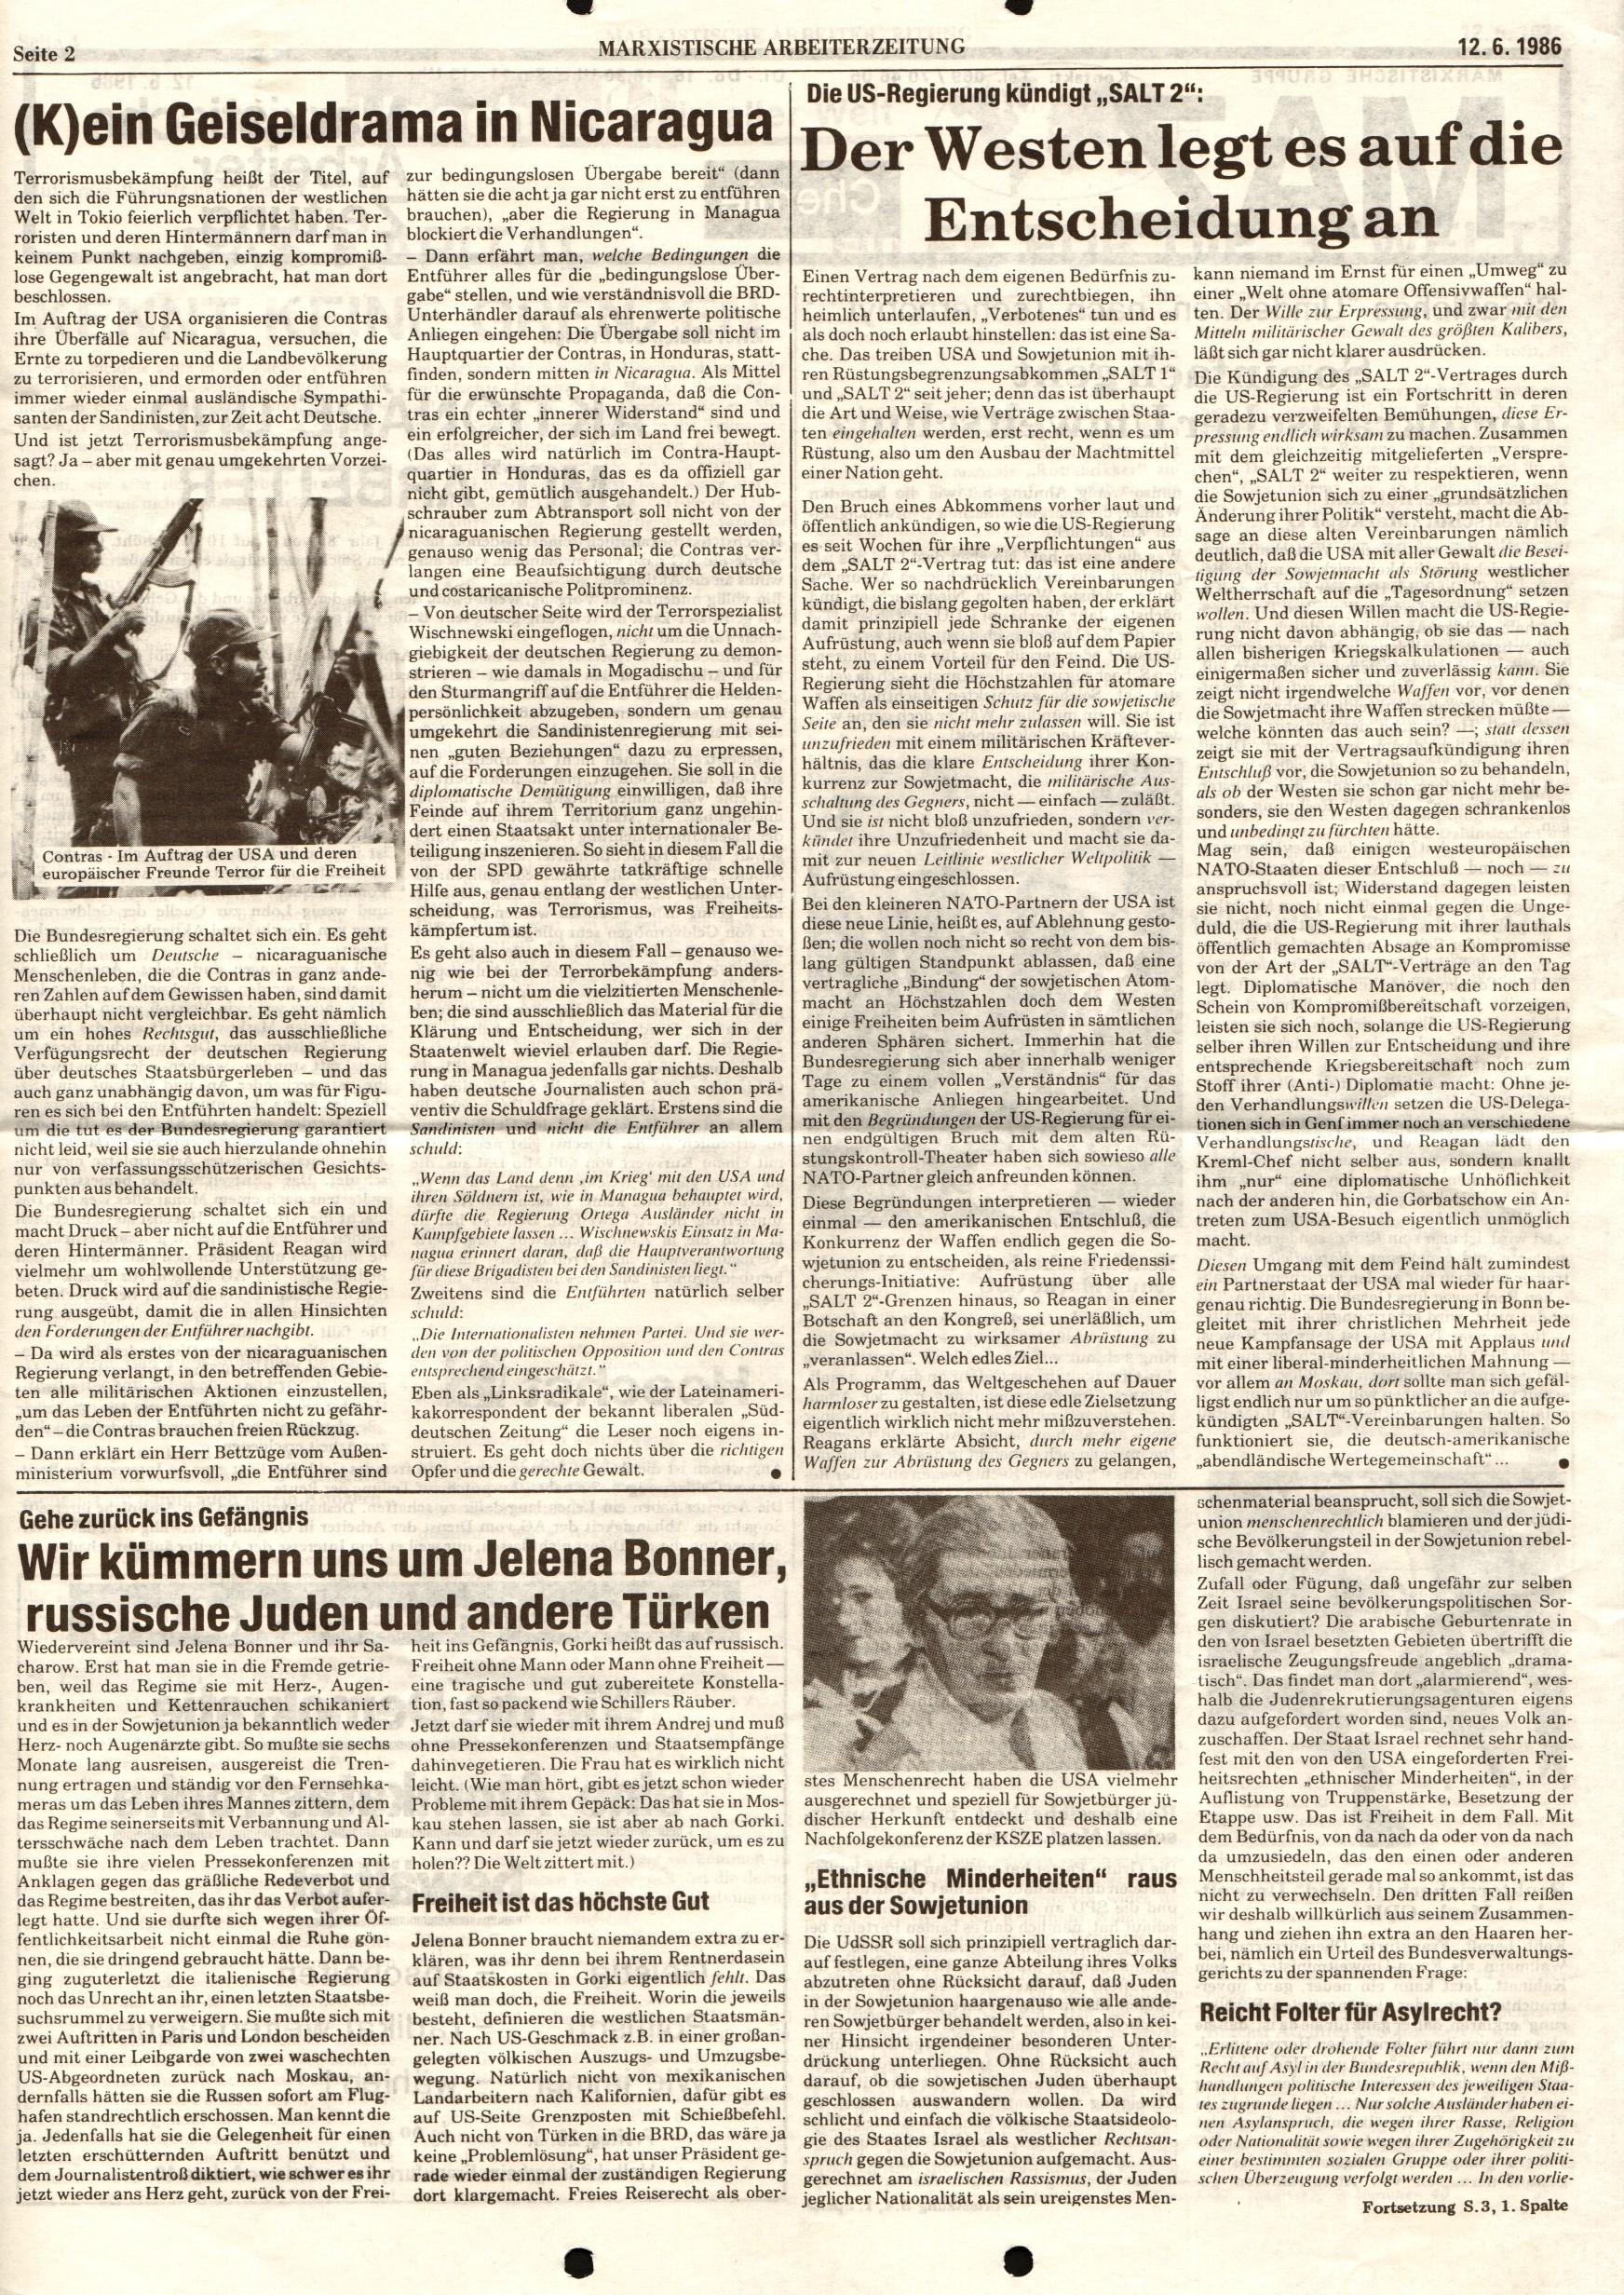 Frankfurt_CPK_Hoechst_MAZ382